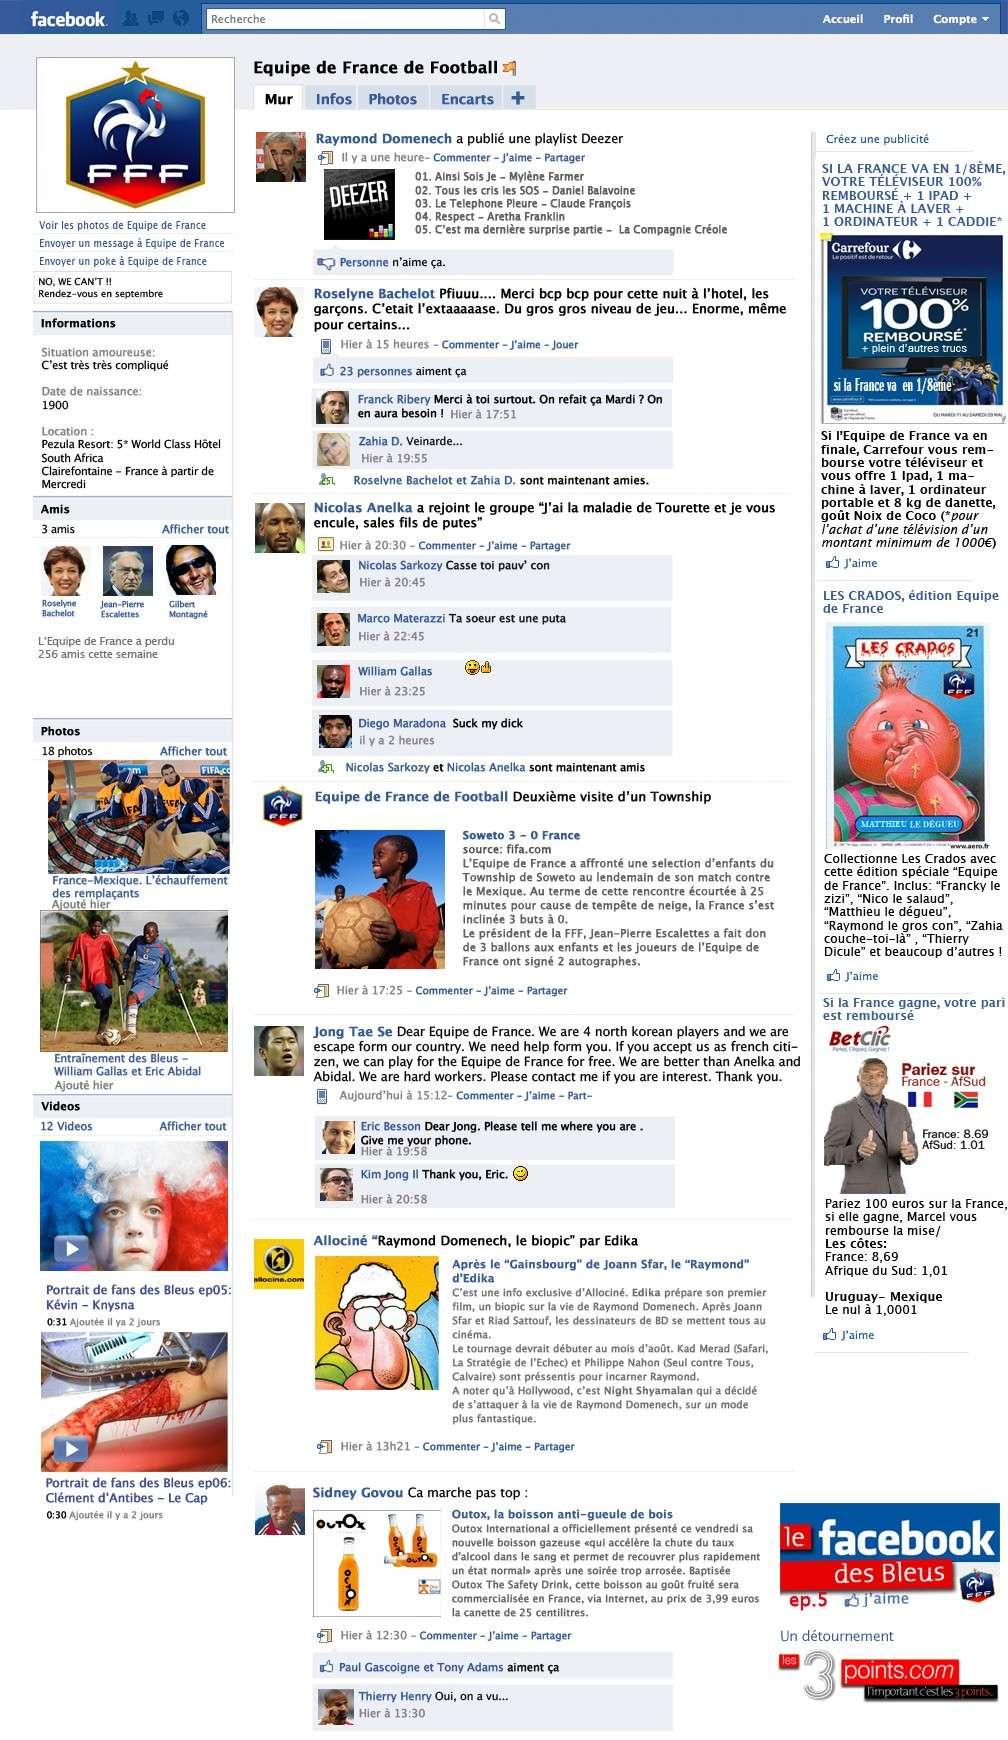 Allez les bleus Facebo10